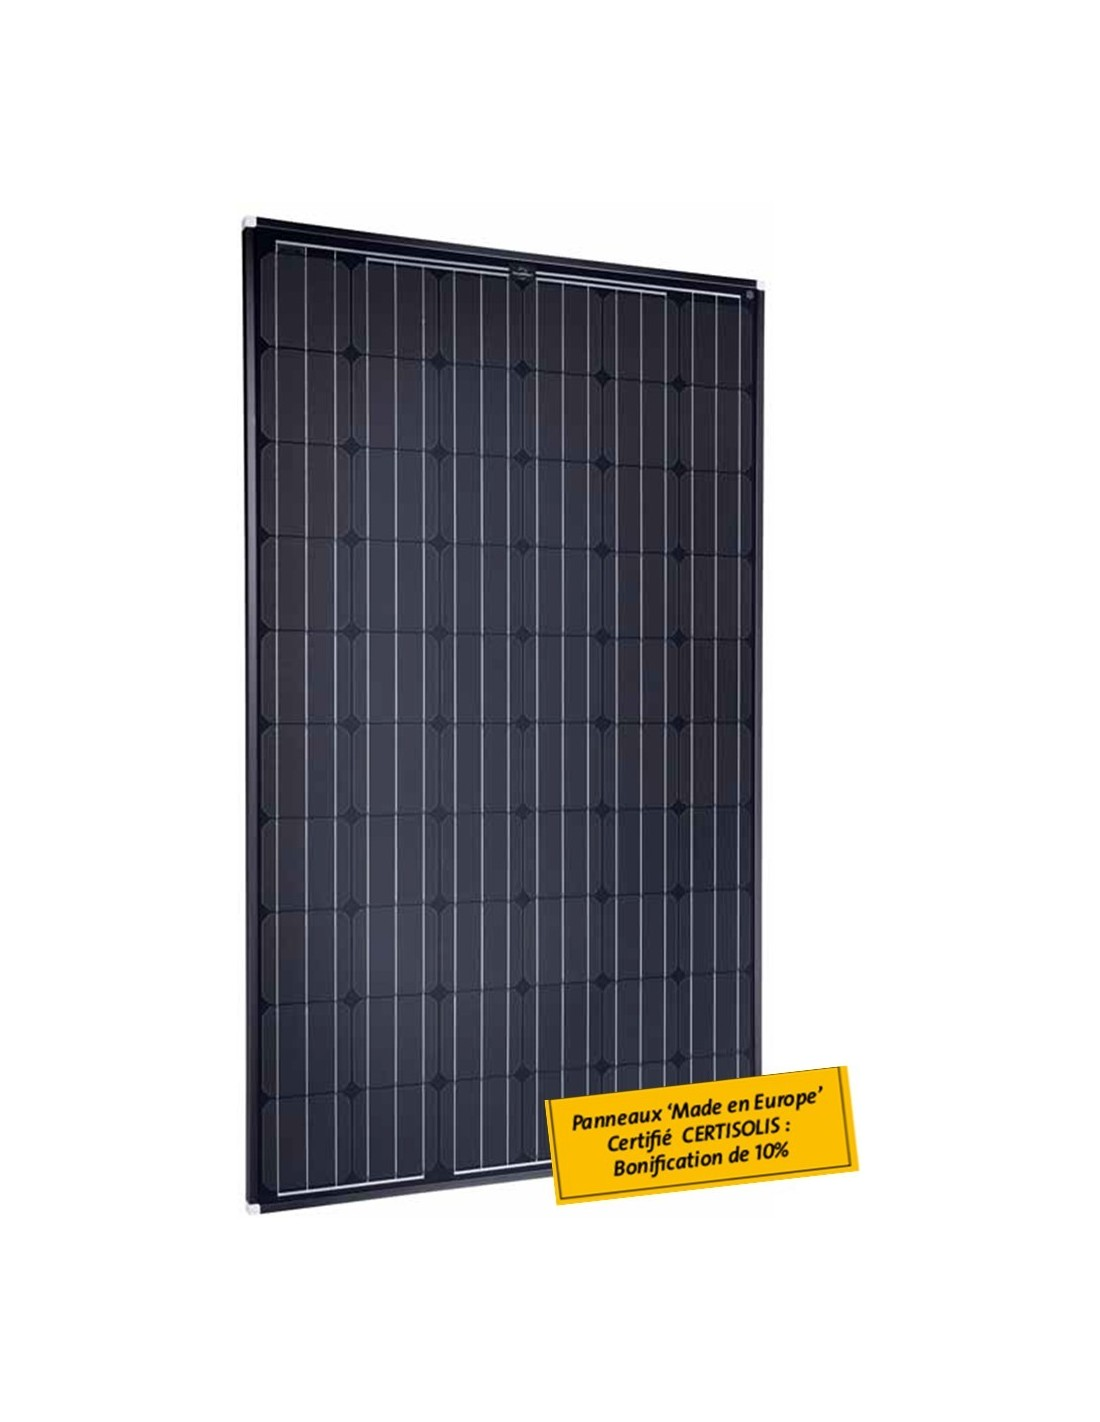 panneau solaire 250w black monochristallin ebay. Black Bedroom Furniture Sets. Home Design Ideas